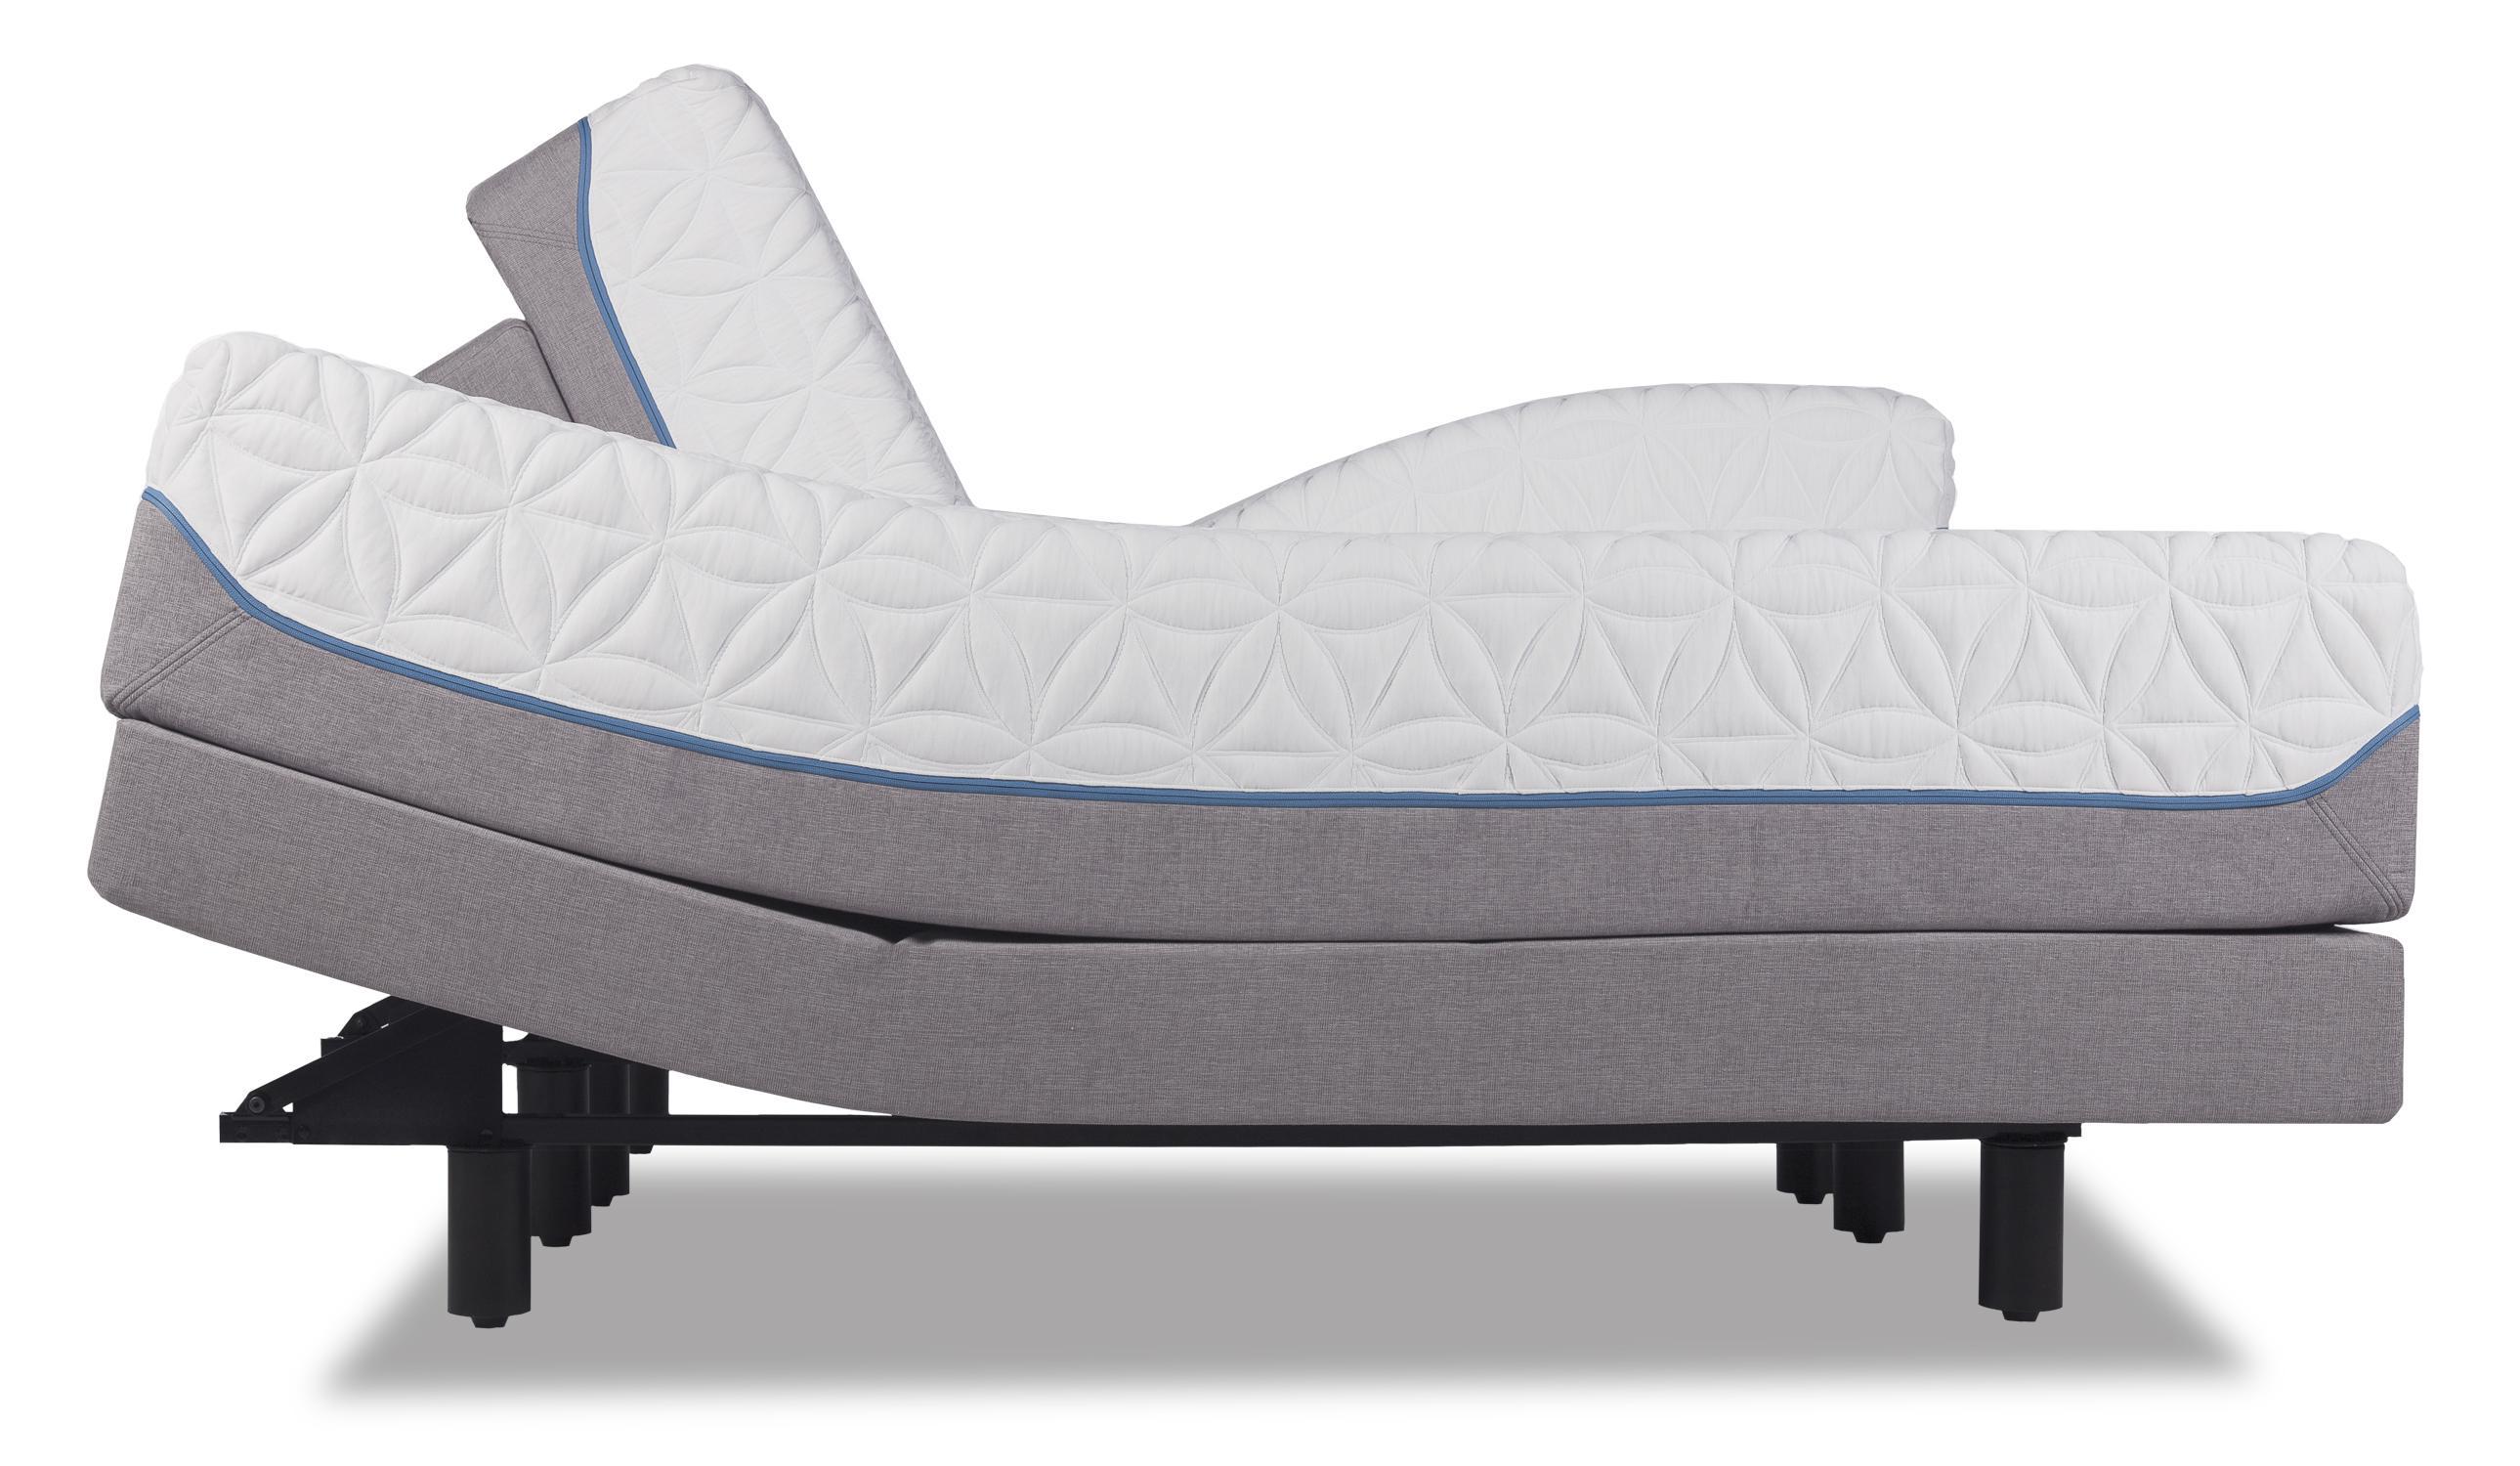 Tempur Pedic TEMPUR Cloud Luxe King Ultra Soft Mattress